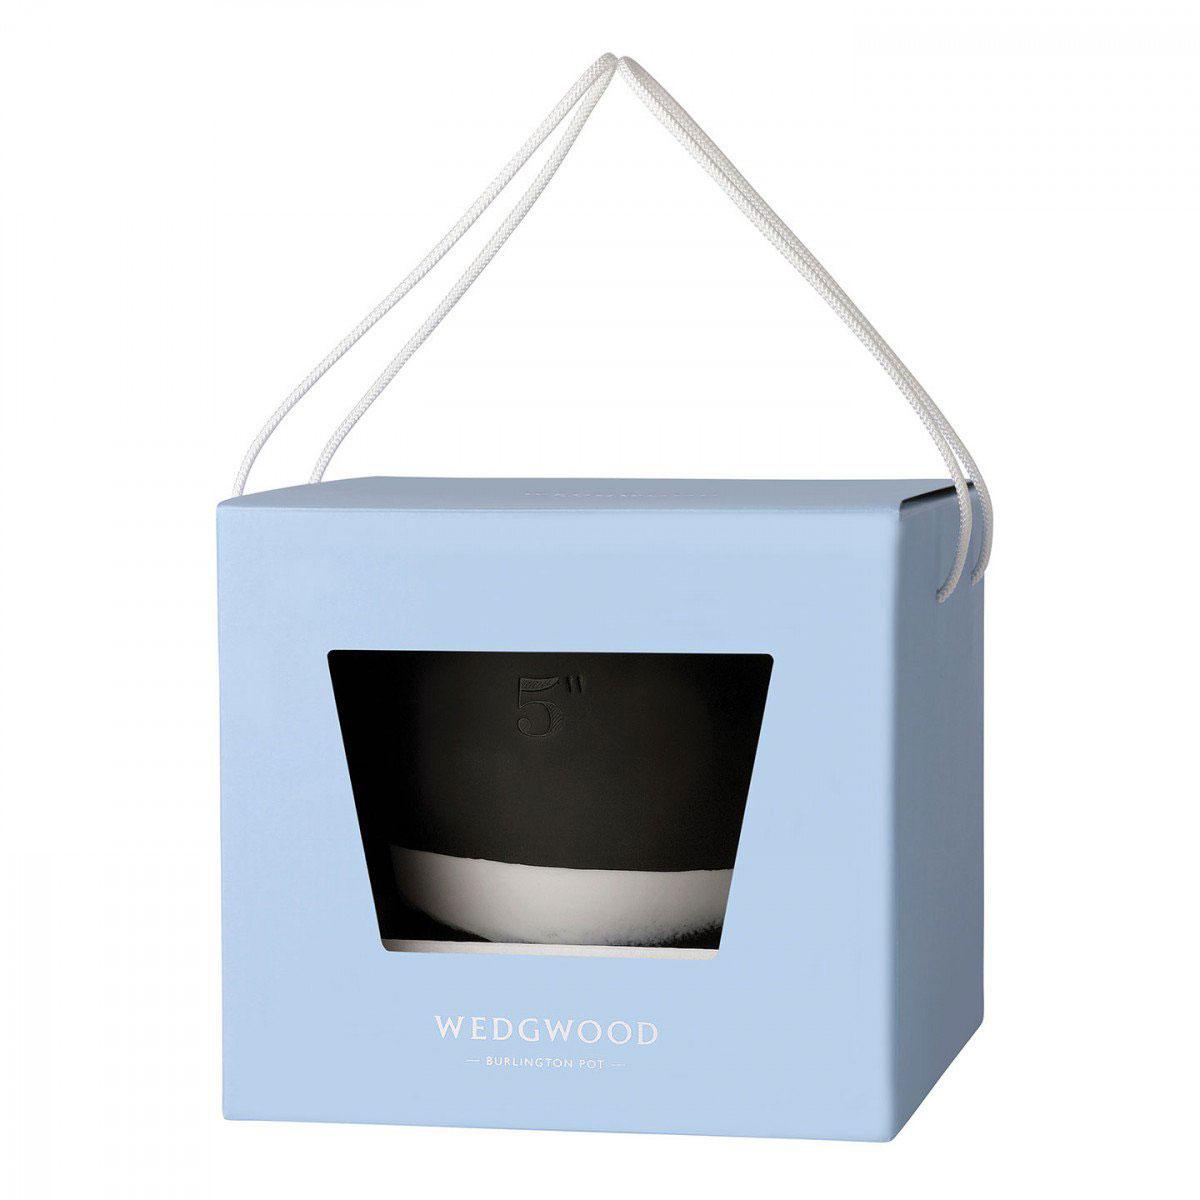 "Wedgwood Jasperware Burlington Pot 5"", Black and White"